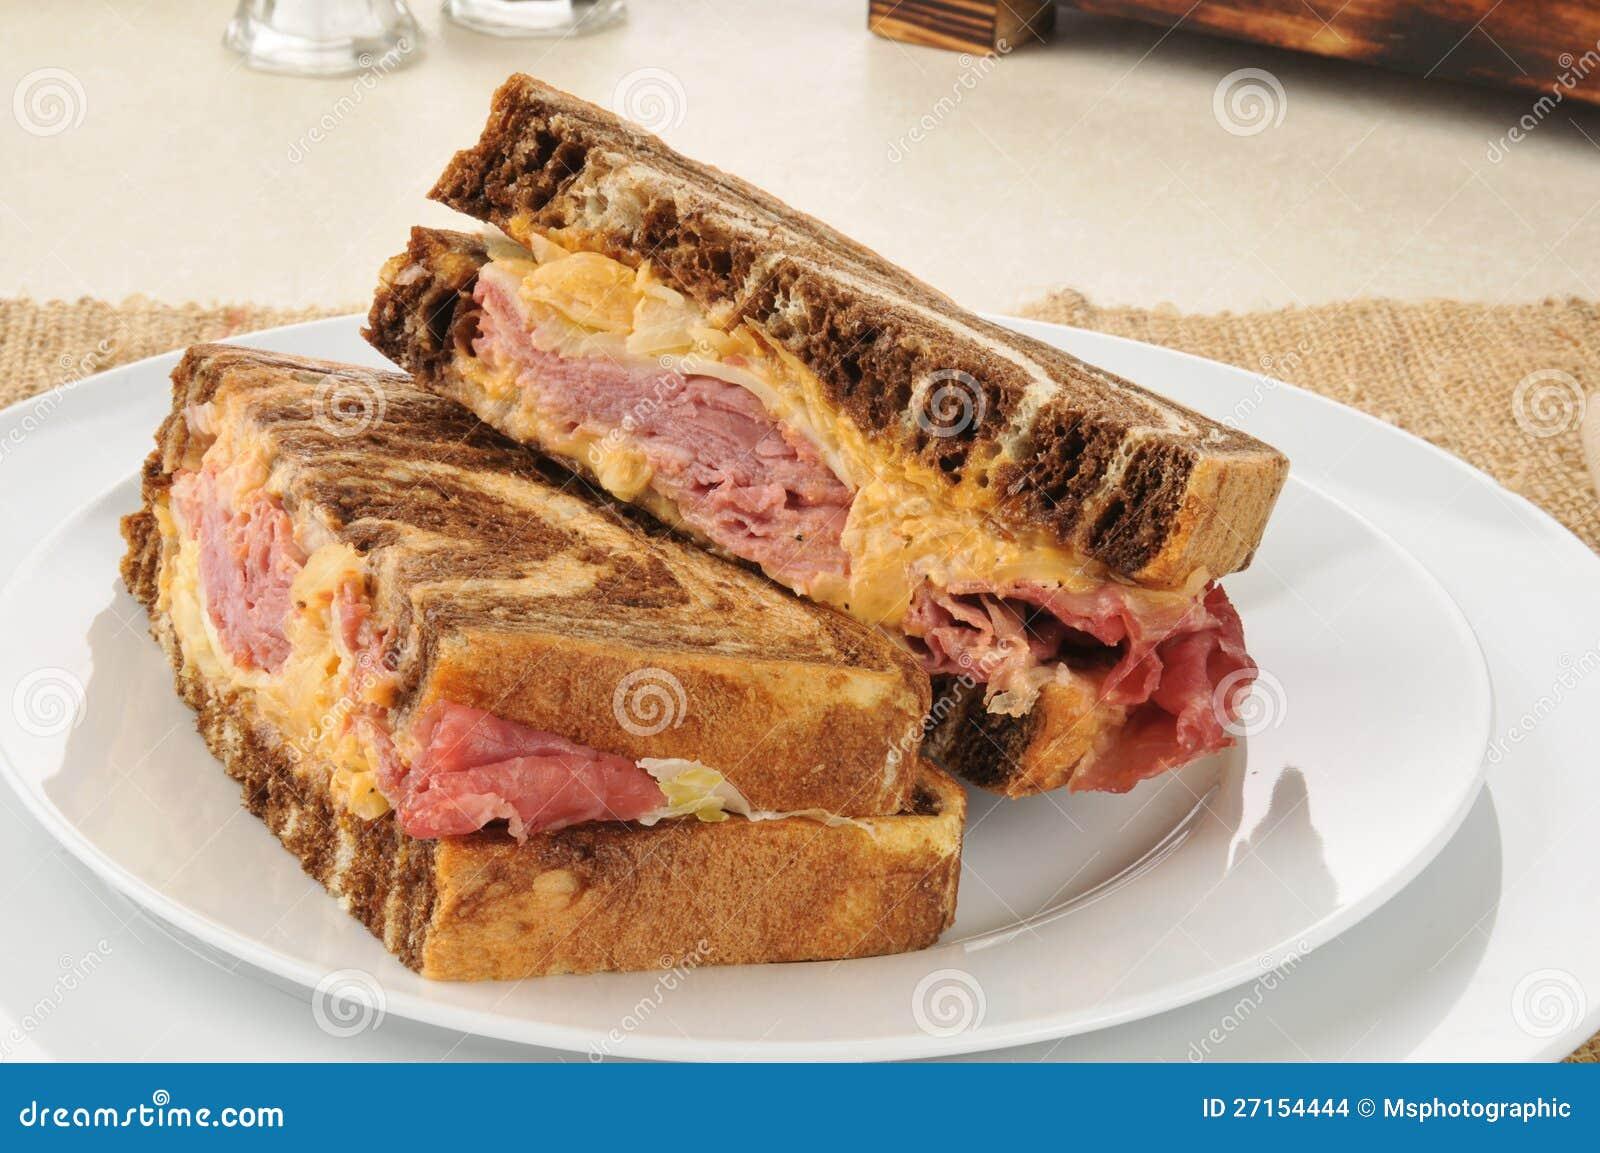 Reuben Sandwich On Marbled Rye Bread Stock Images - Image: 27154444